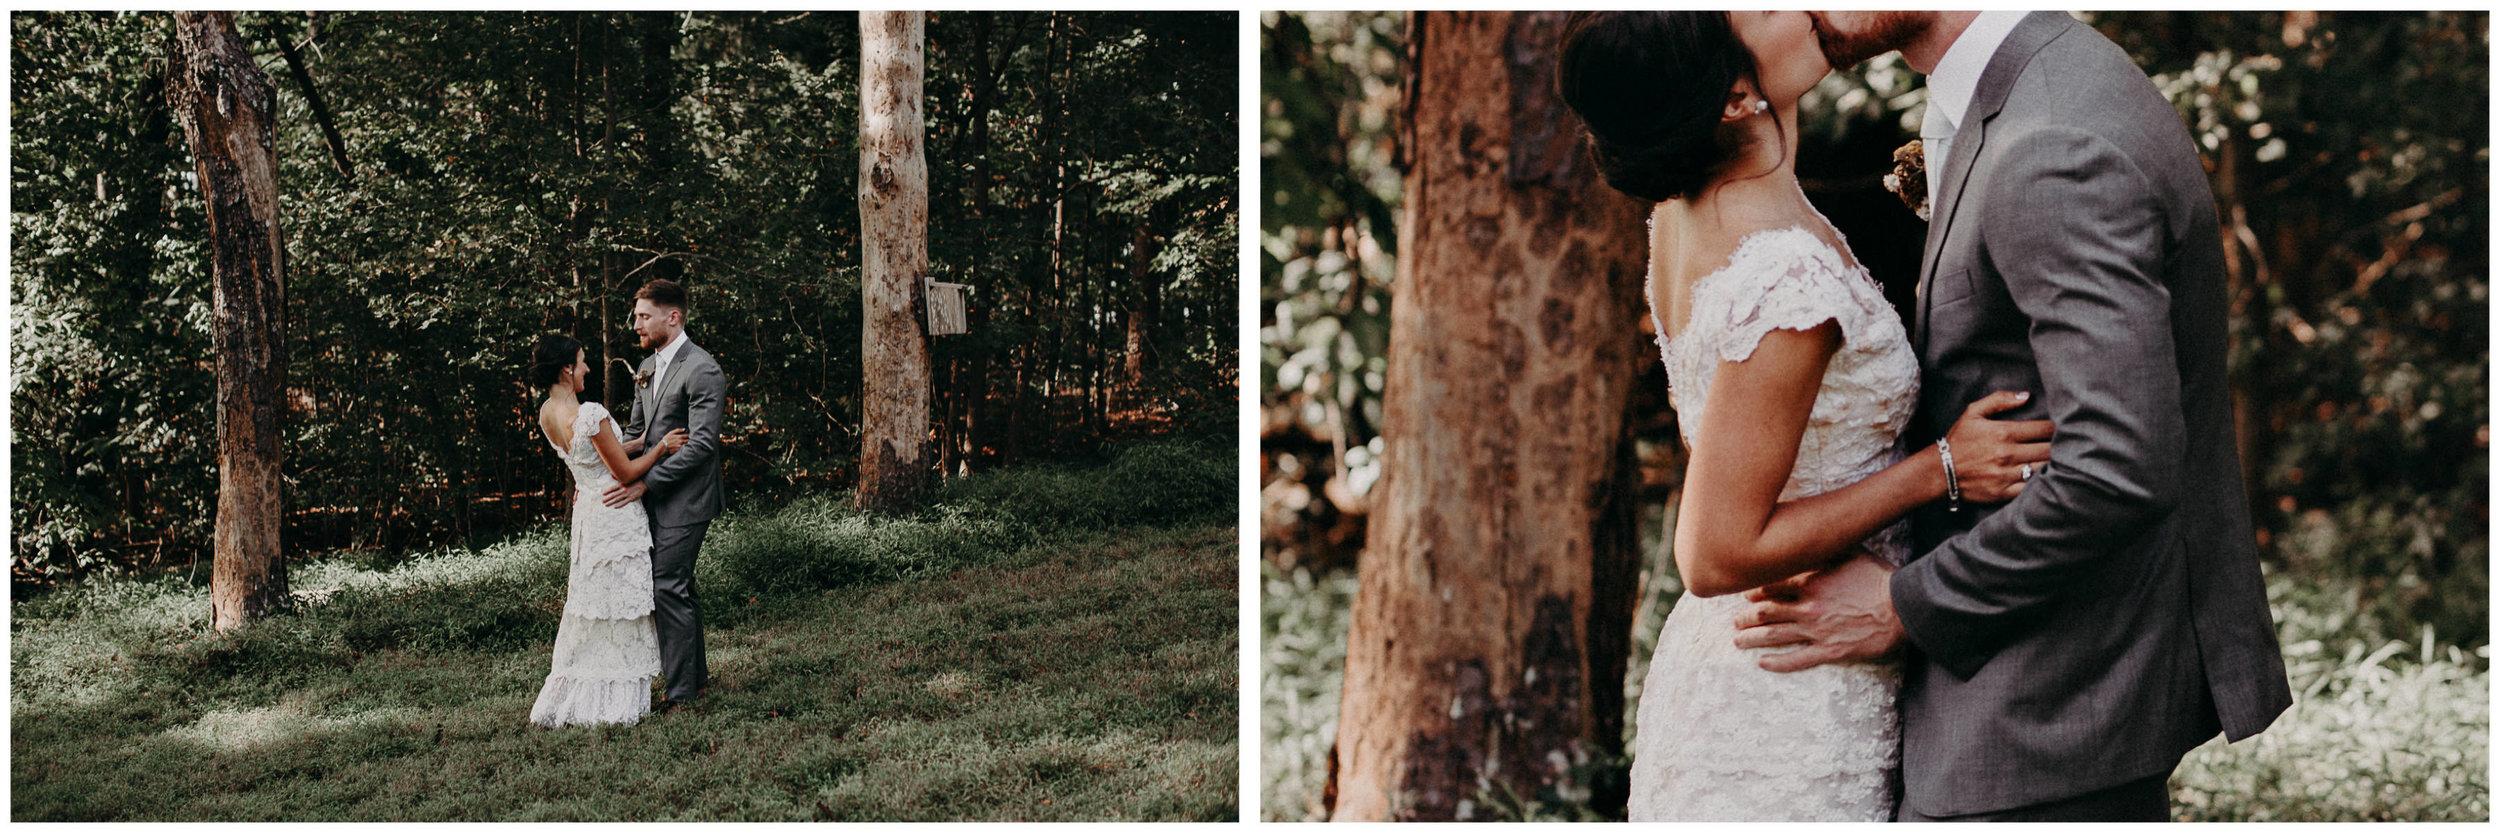 37 Bride & Groom first look before the ceremony on wedding day - Atlanta Wedding Photographer .jpg